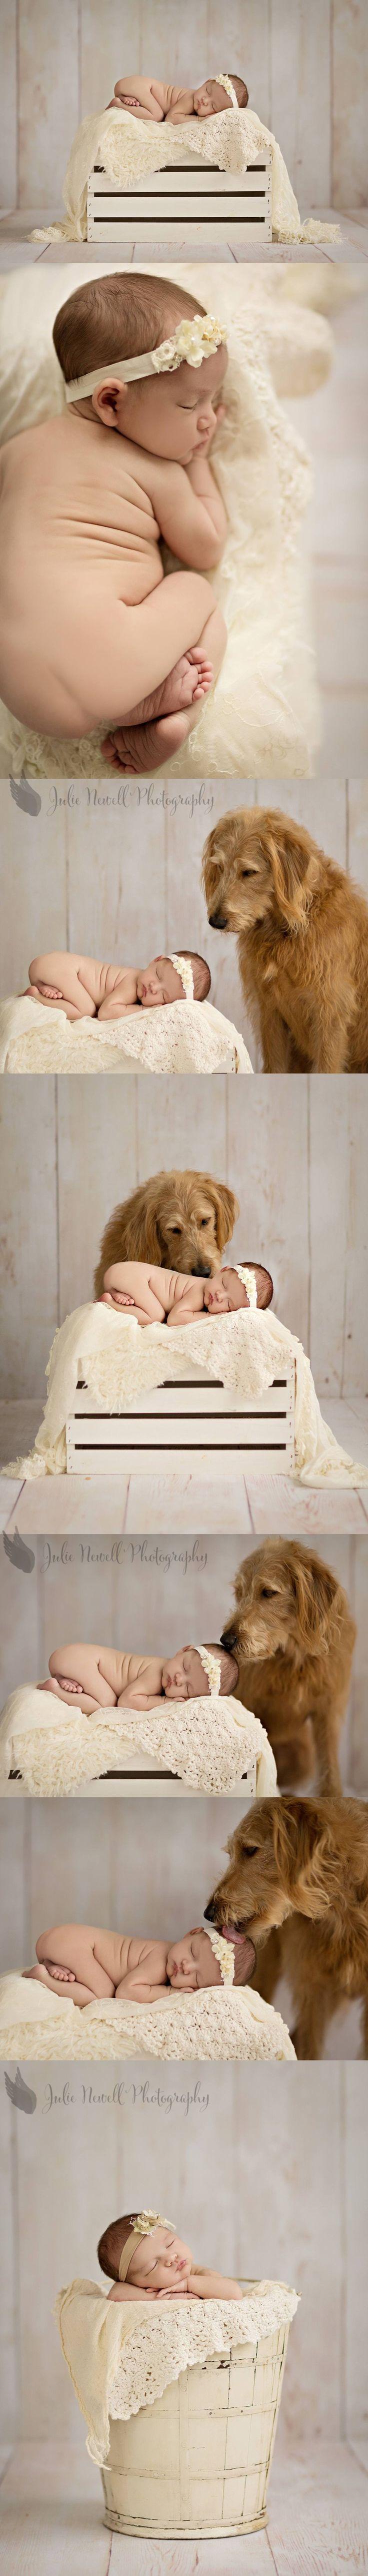 newborn photography https://www.amazon.co.uk/Baby-Car-Mirror-Shatterproof-Installation/dp/B06XHG6SSY/ref=sr_1_2?ie=UTF8&qid=1499074433&sr=8-2&keywords=Kingseye